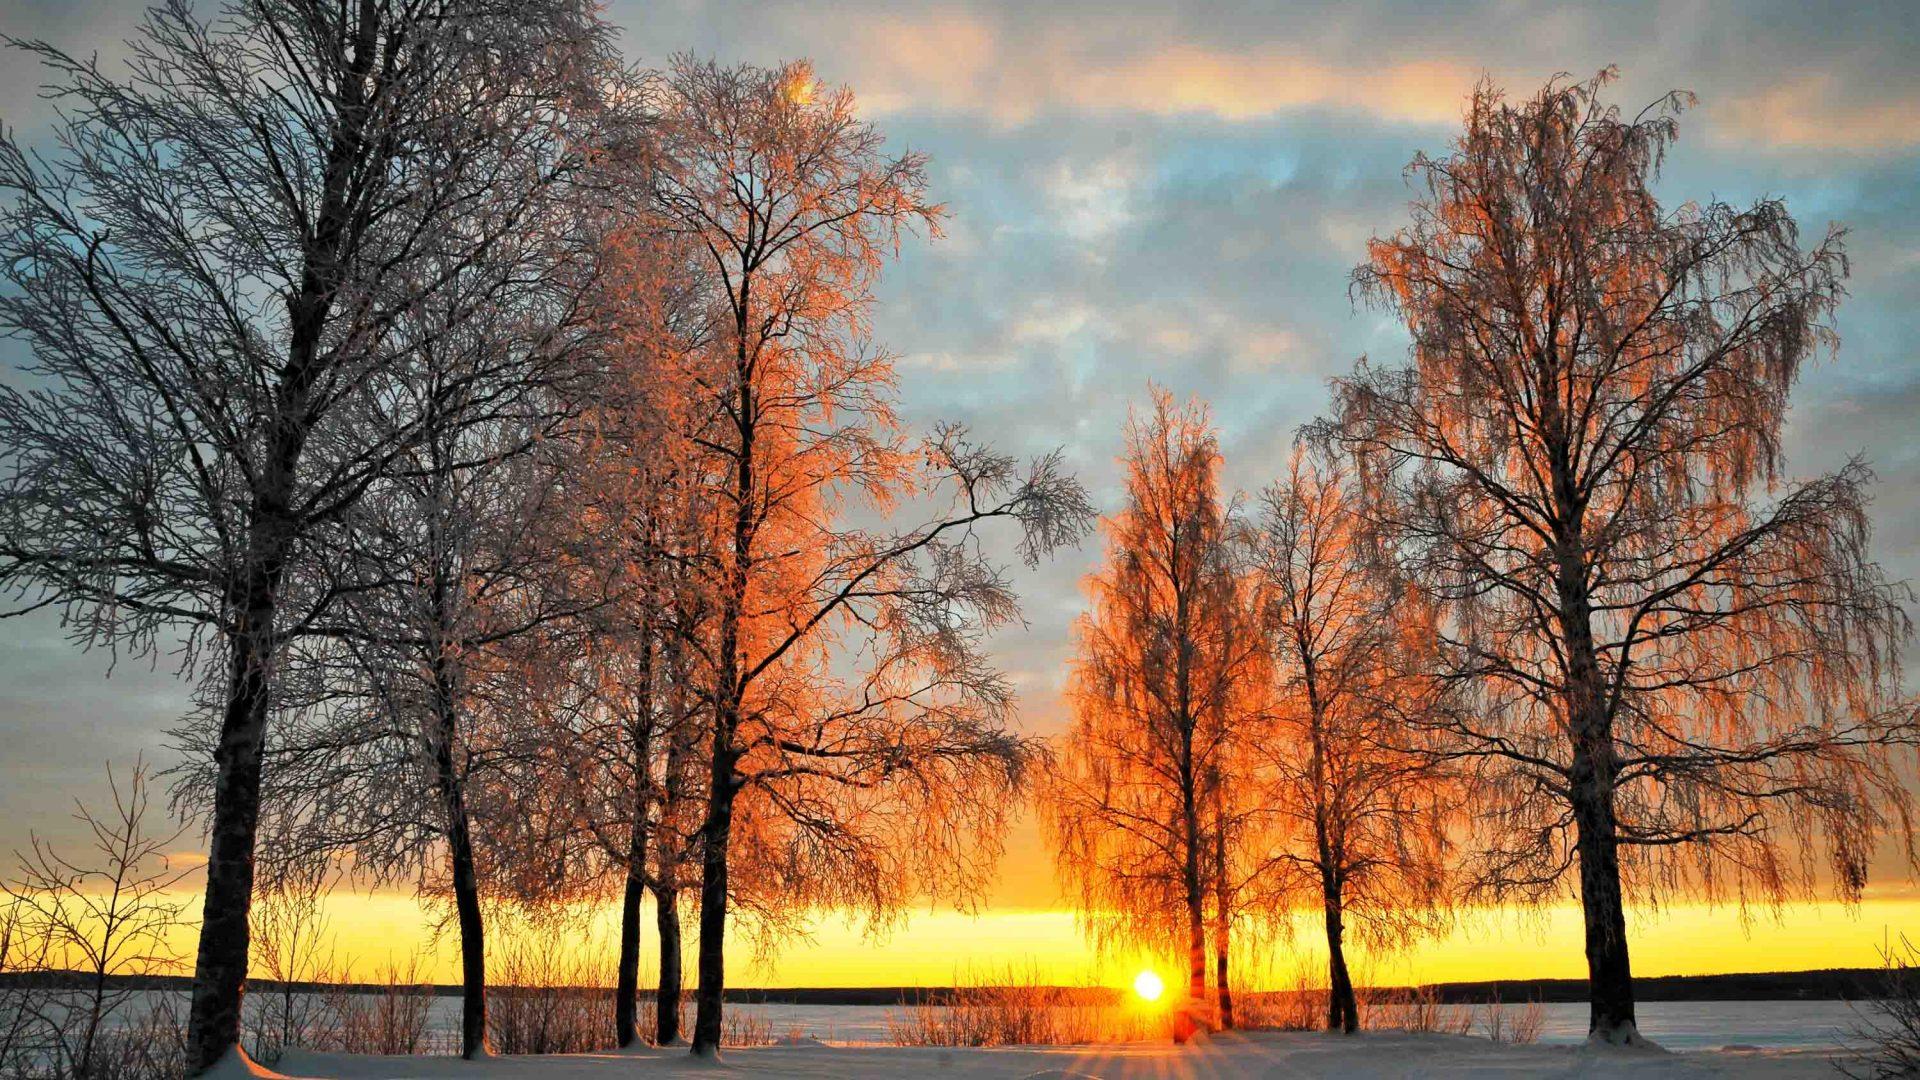 The sun sets in the small village of Jukkasjärvi, Sweden's northernmost town.